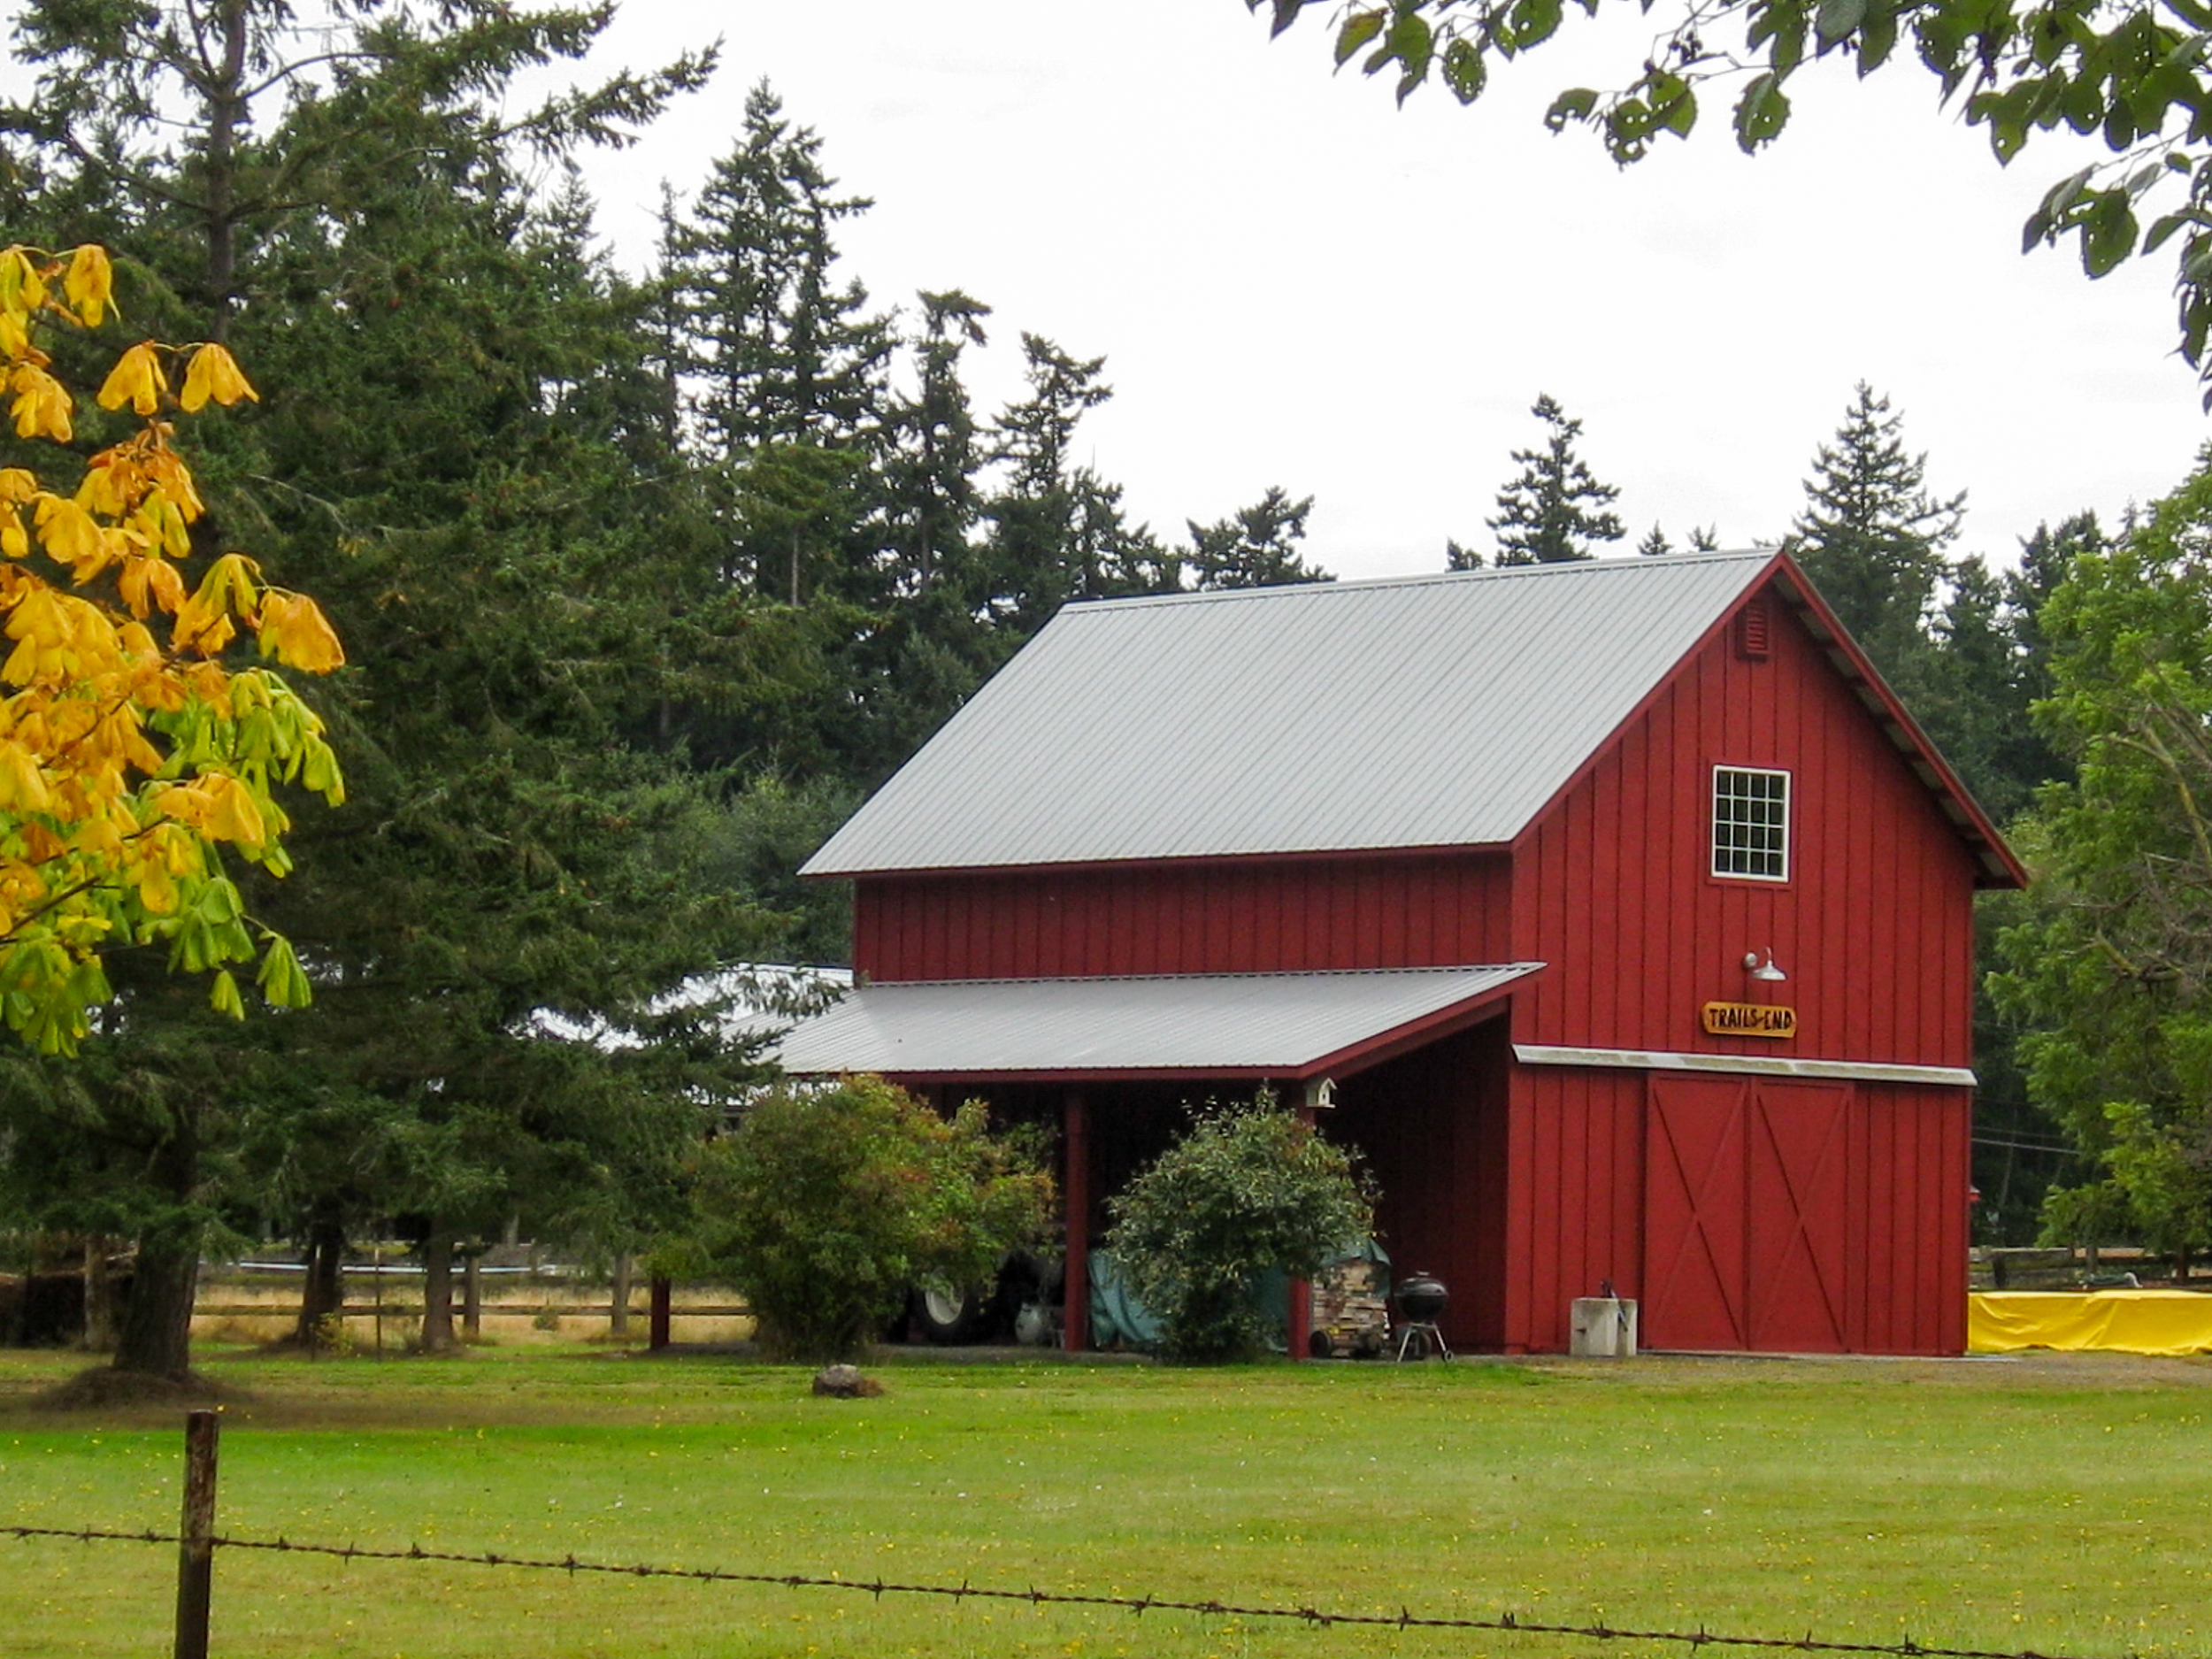 barn builder, horse barn, skagit county barn builder